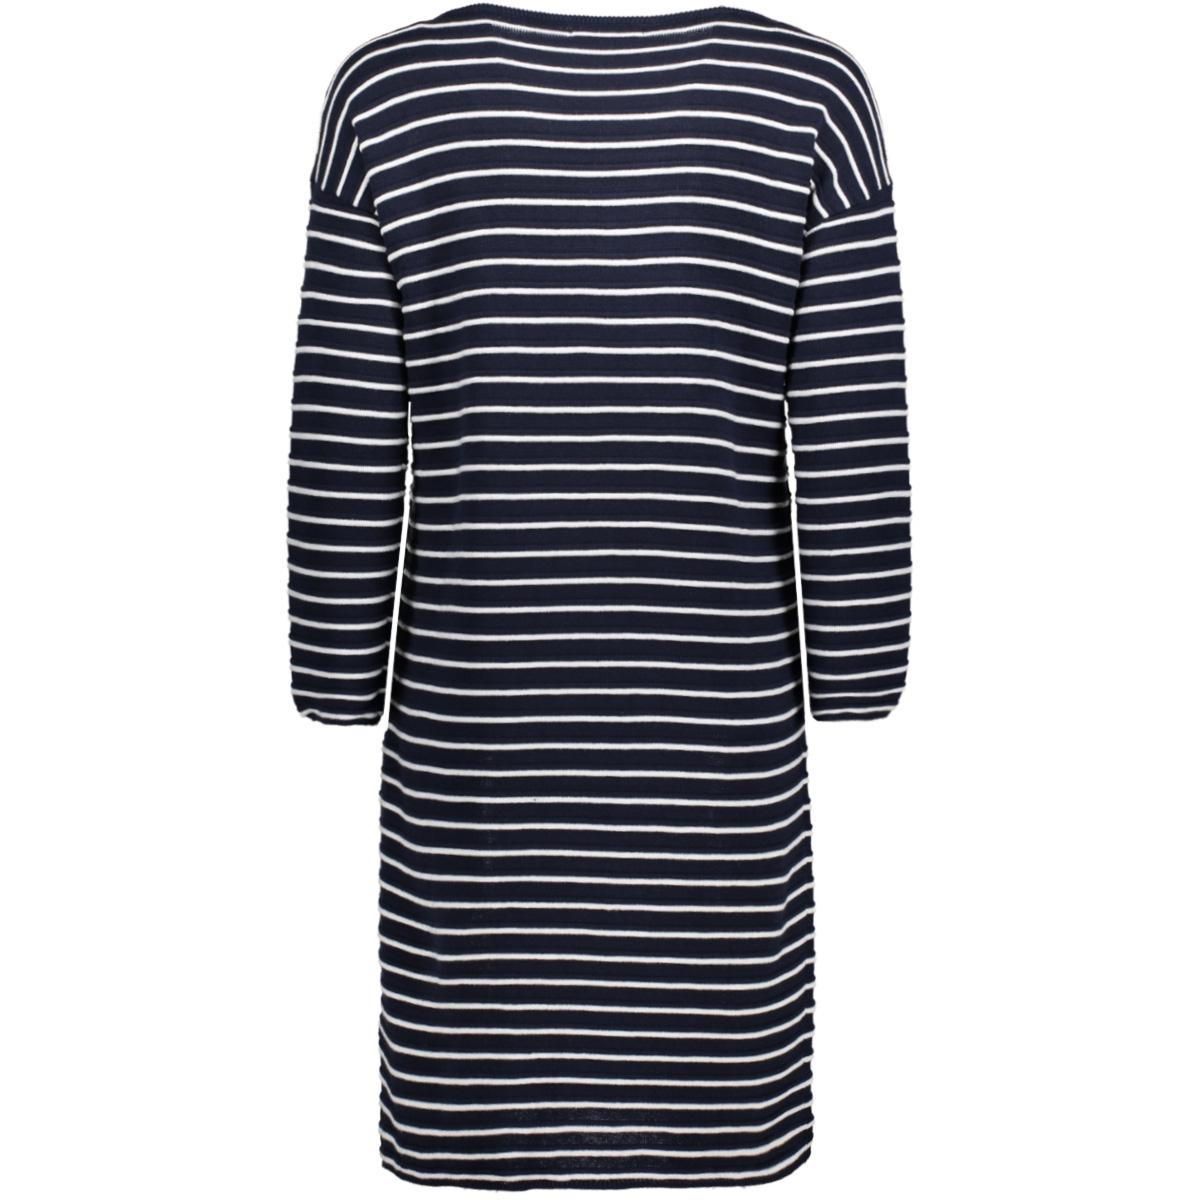 5055042.62.71 tom tailor jurk 1001